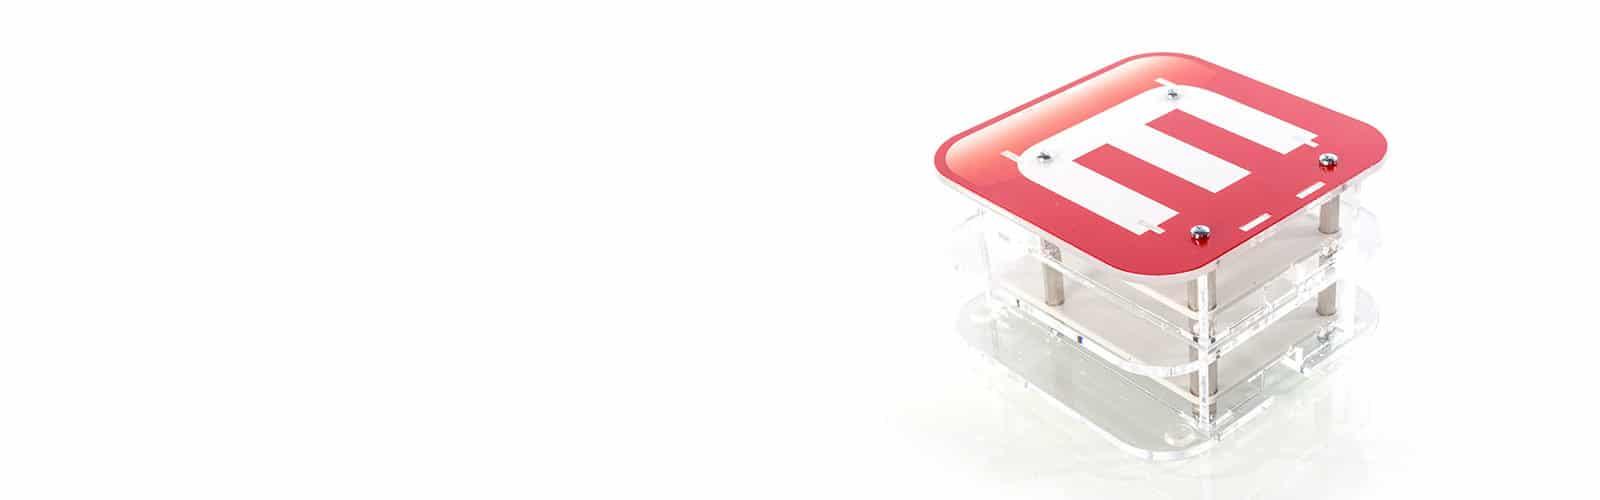 Raspberry Pie Gehäuse: schickes Kunststoffgehäuse aus Acrylglas